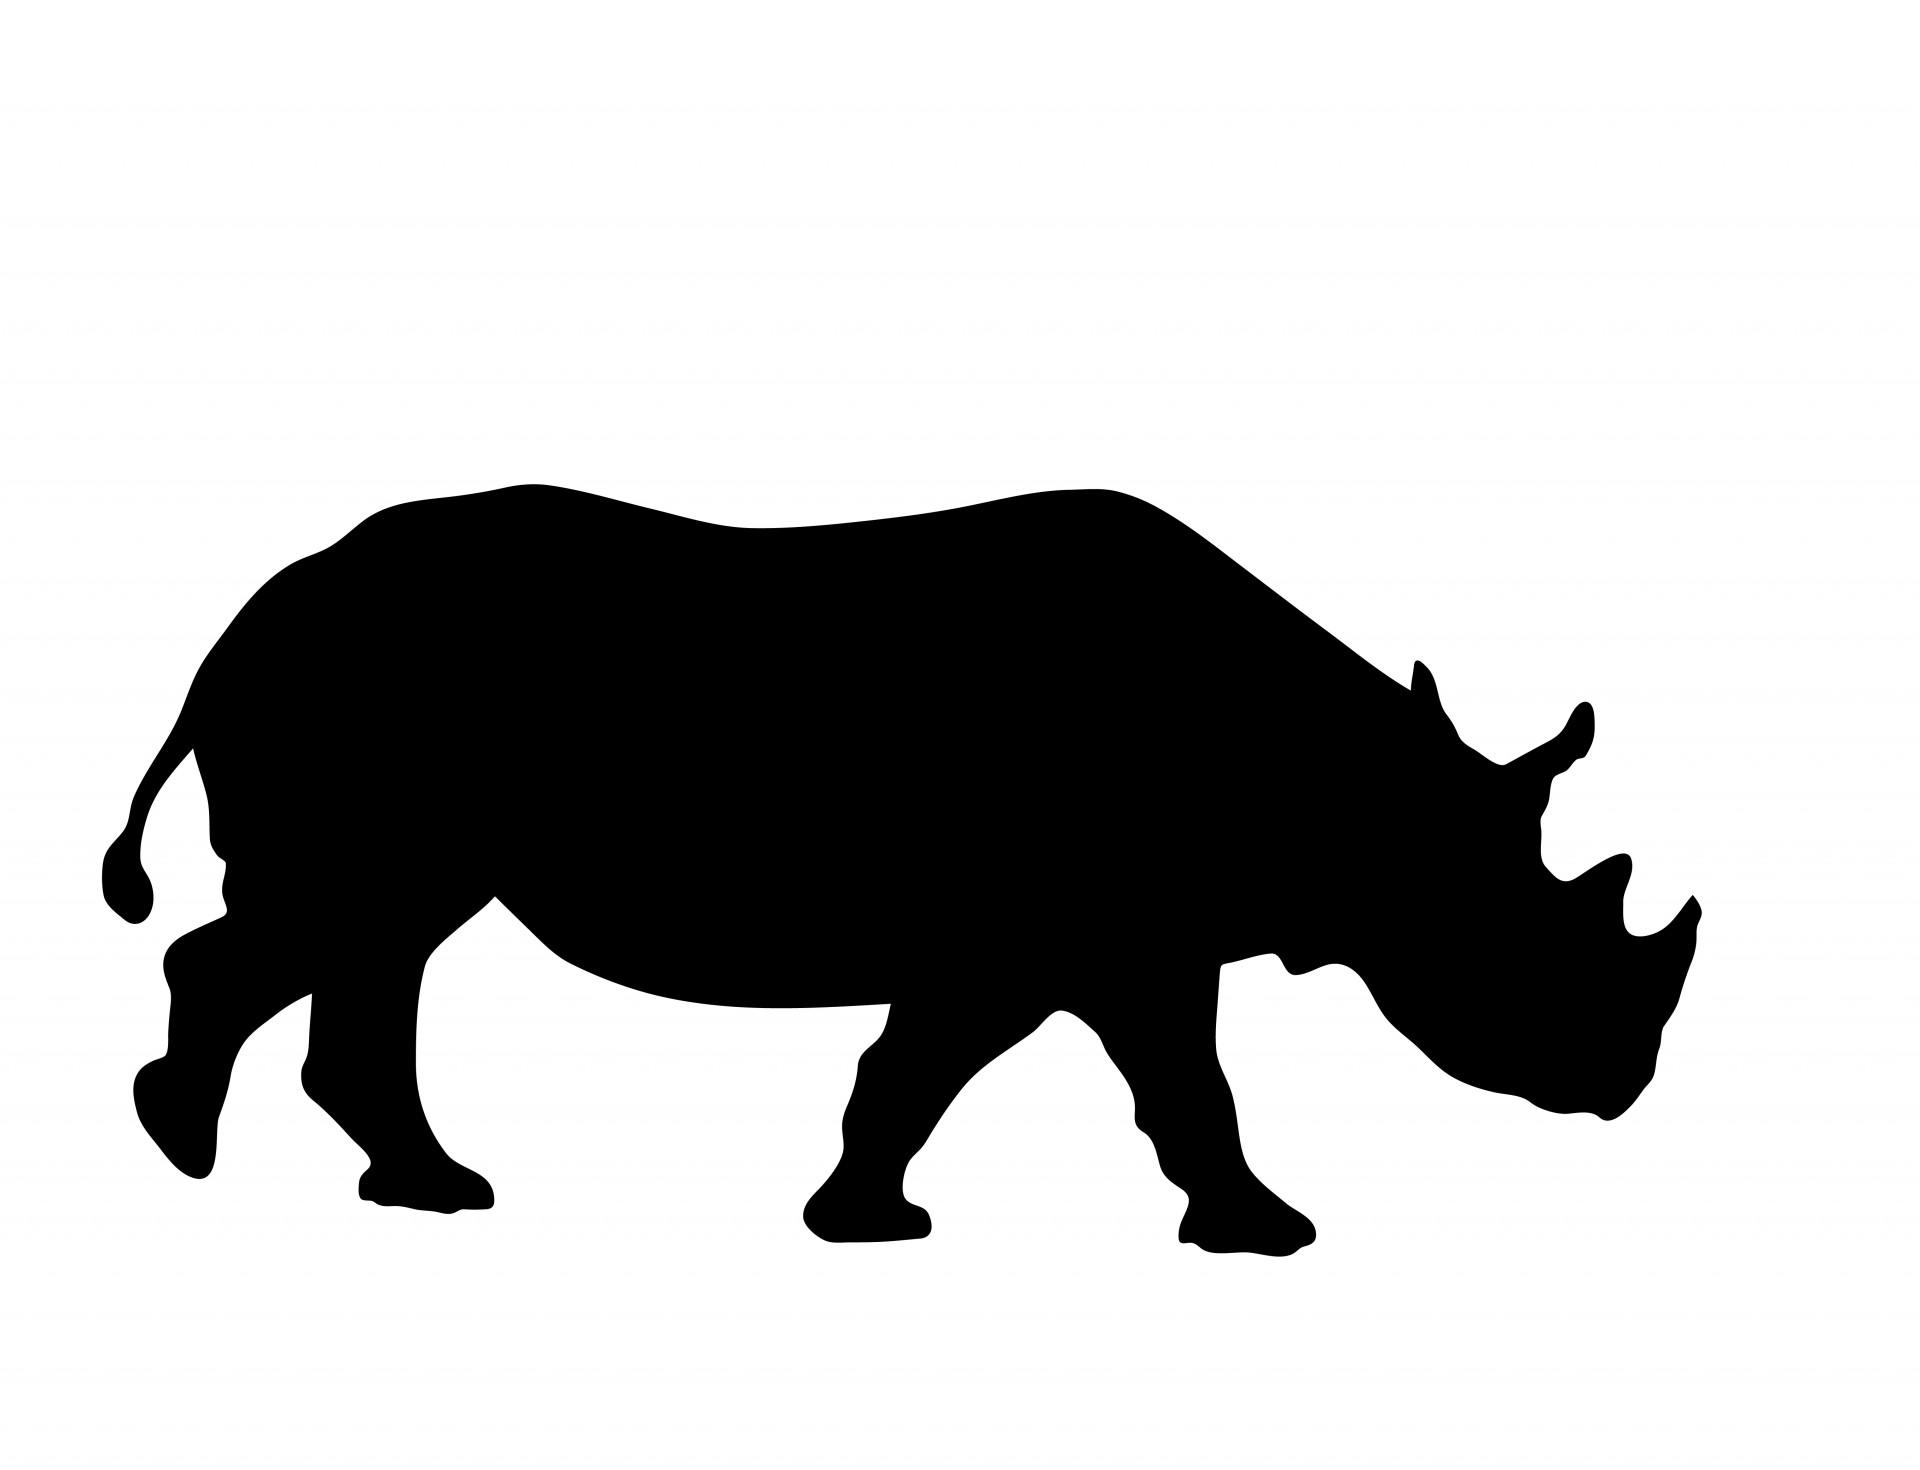 Rhino Silhouette Clipart Free Stock Photo.